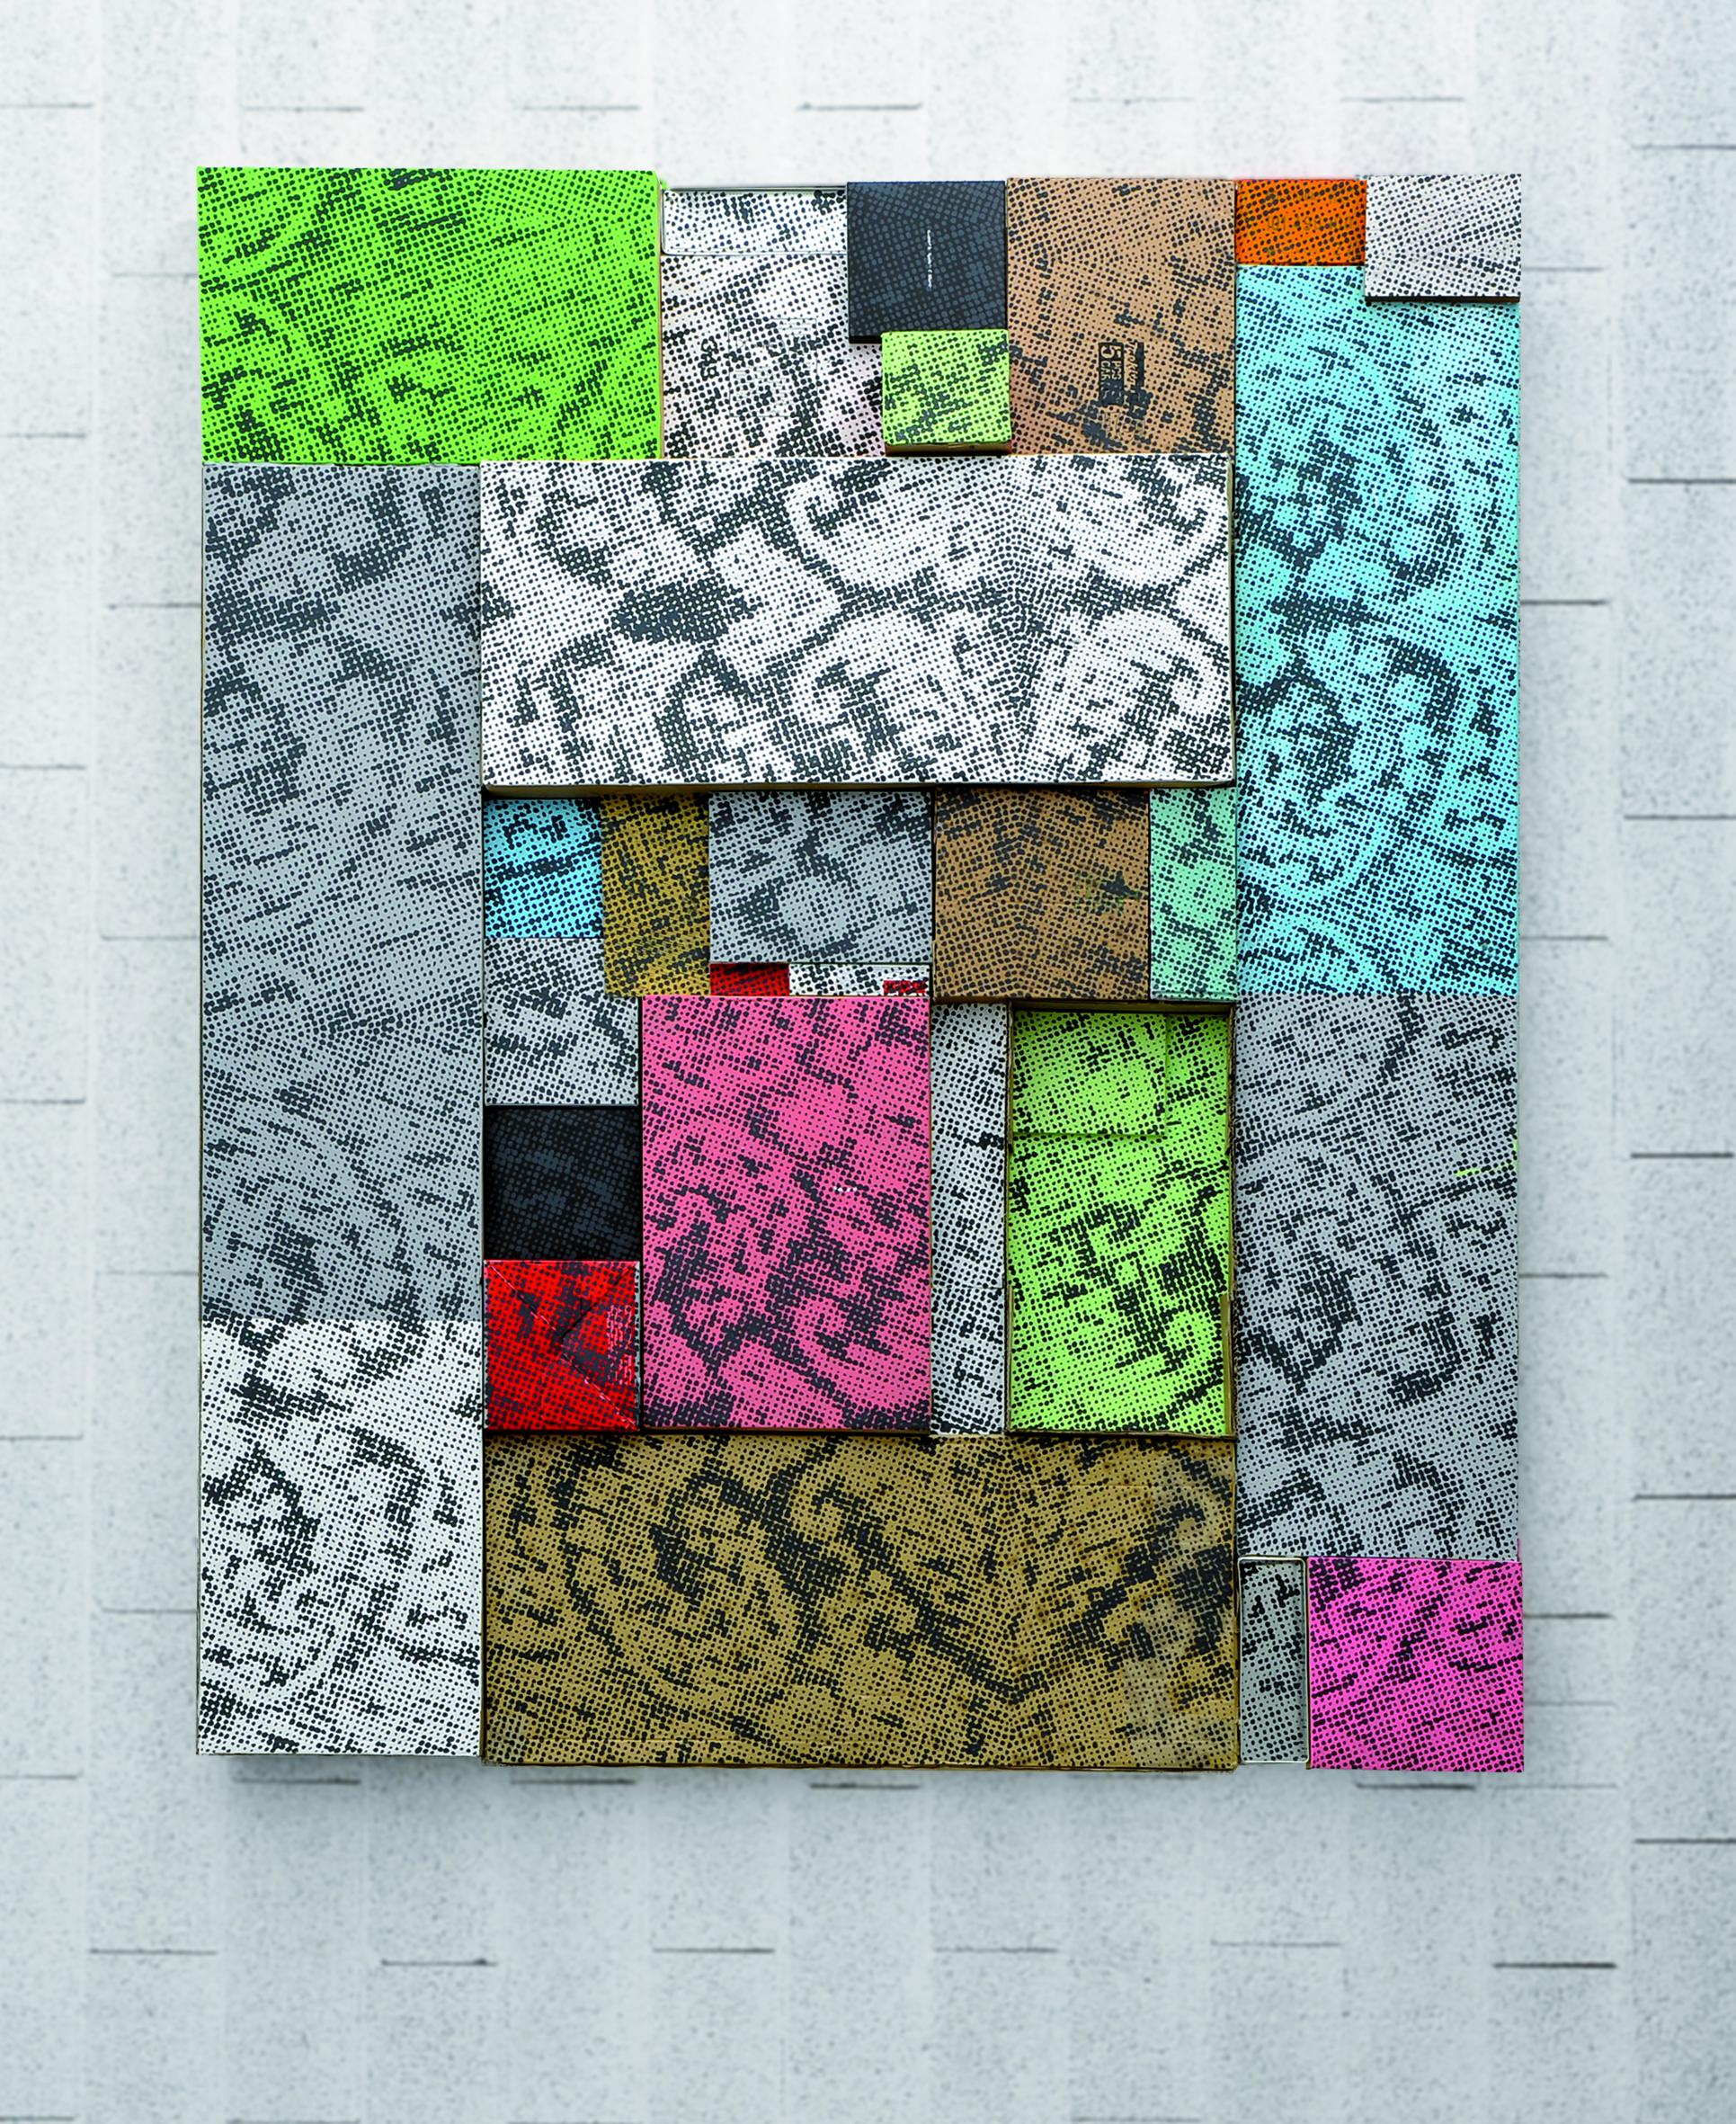 Arnold Mario Dall'O, Karton 1, pittura acrilica su cartone, 2011